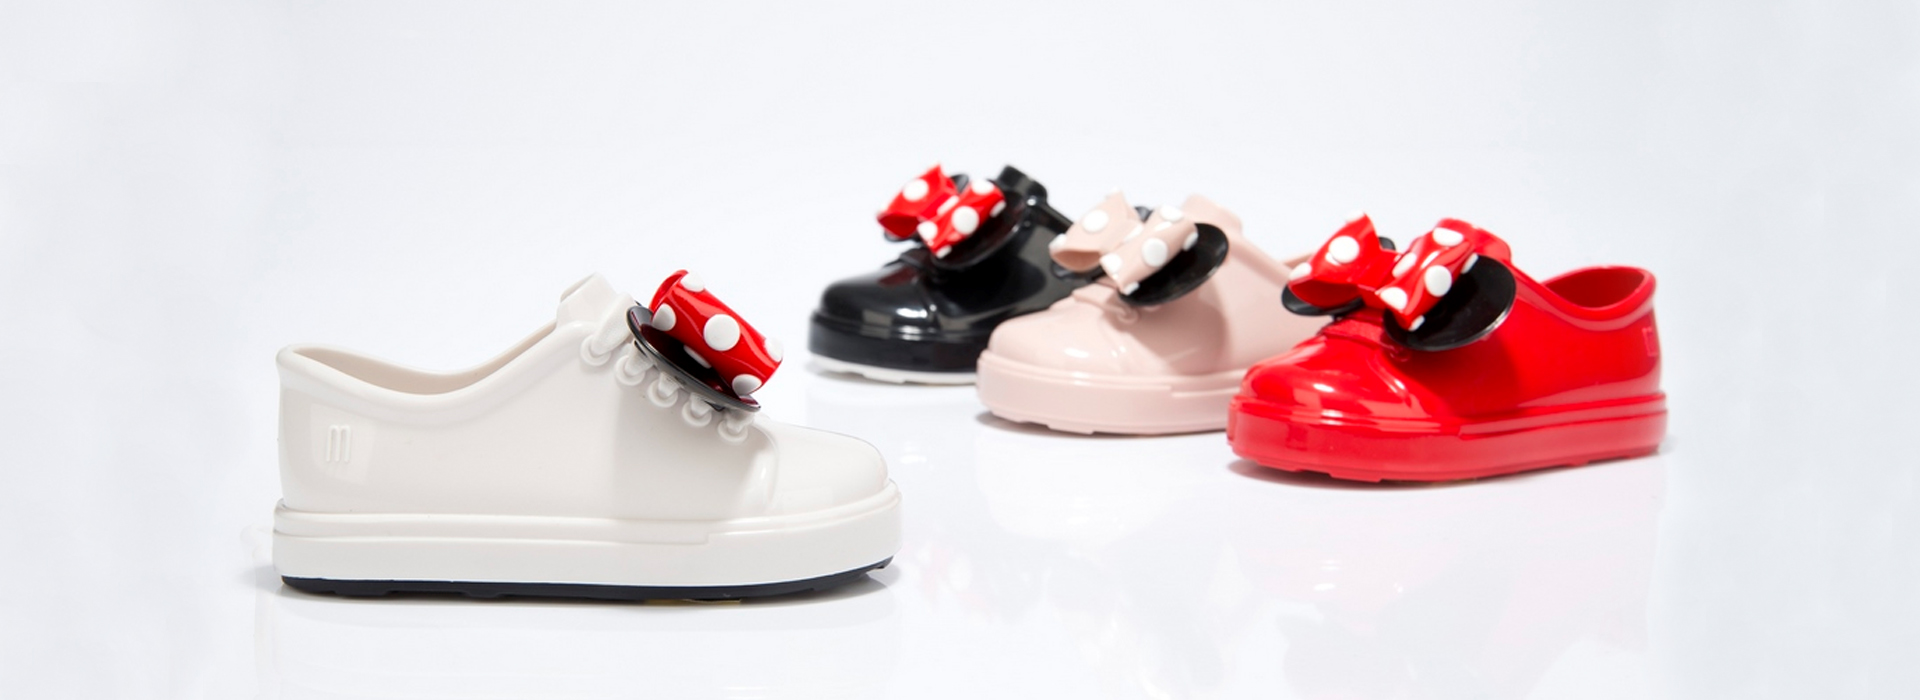 Nowa kolekcja butów Mini Melissa